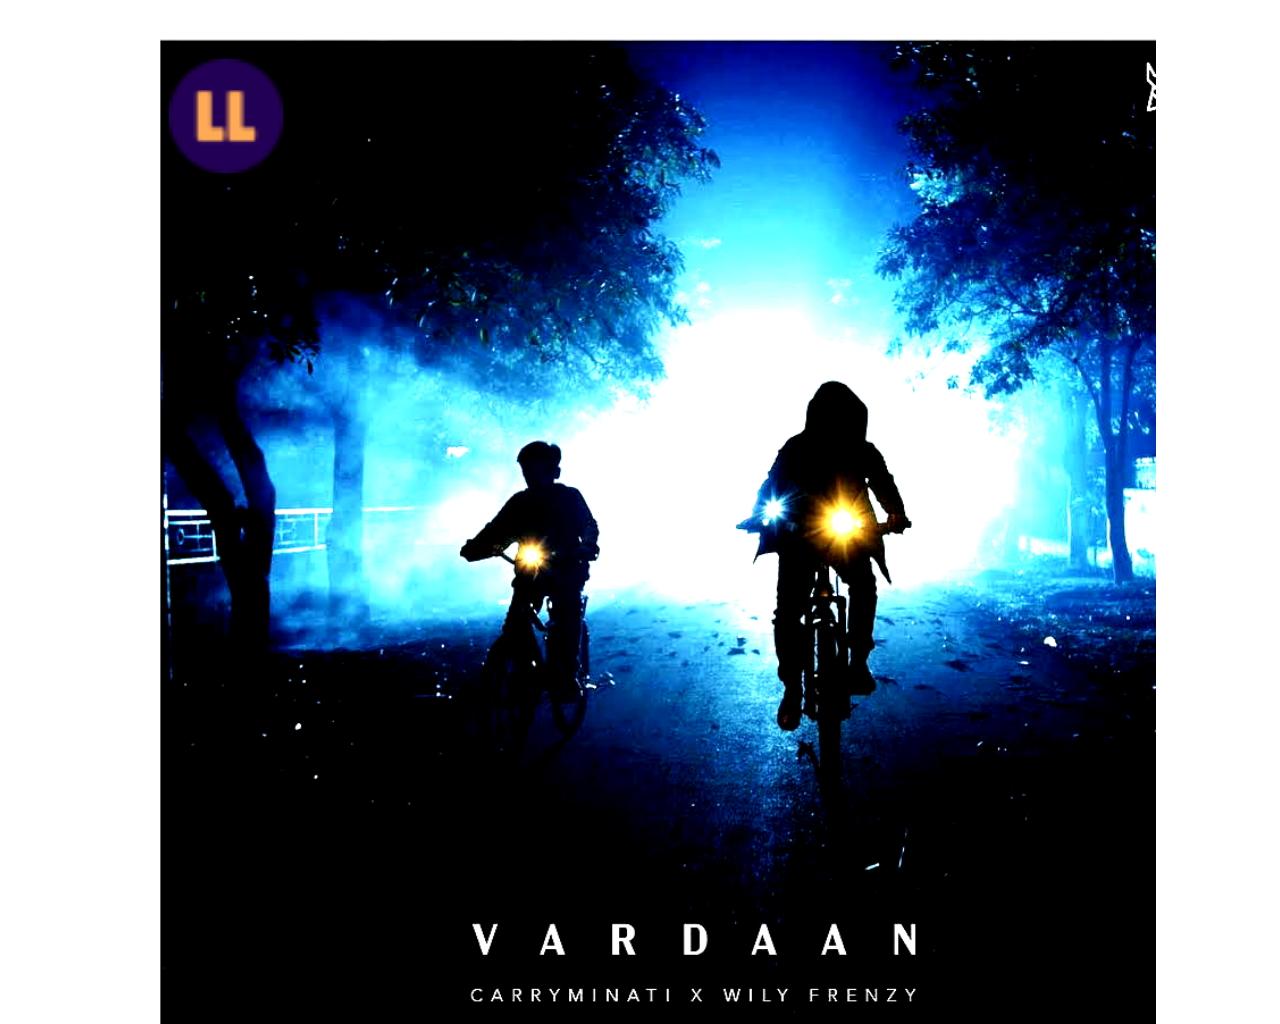 Vardaan Song Lyrics Hindi & English - New CarryMinati Song